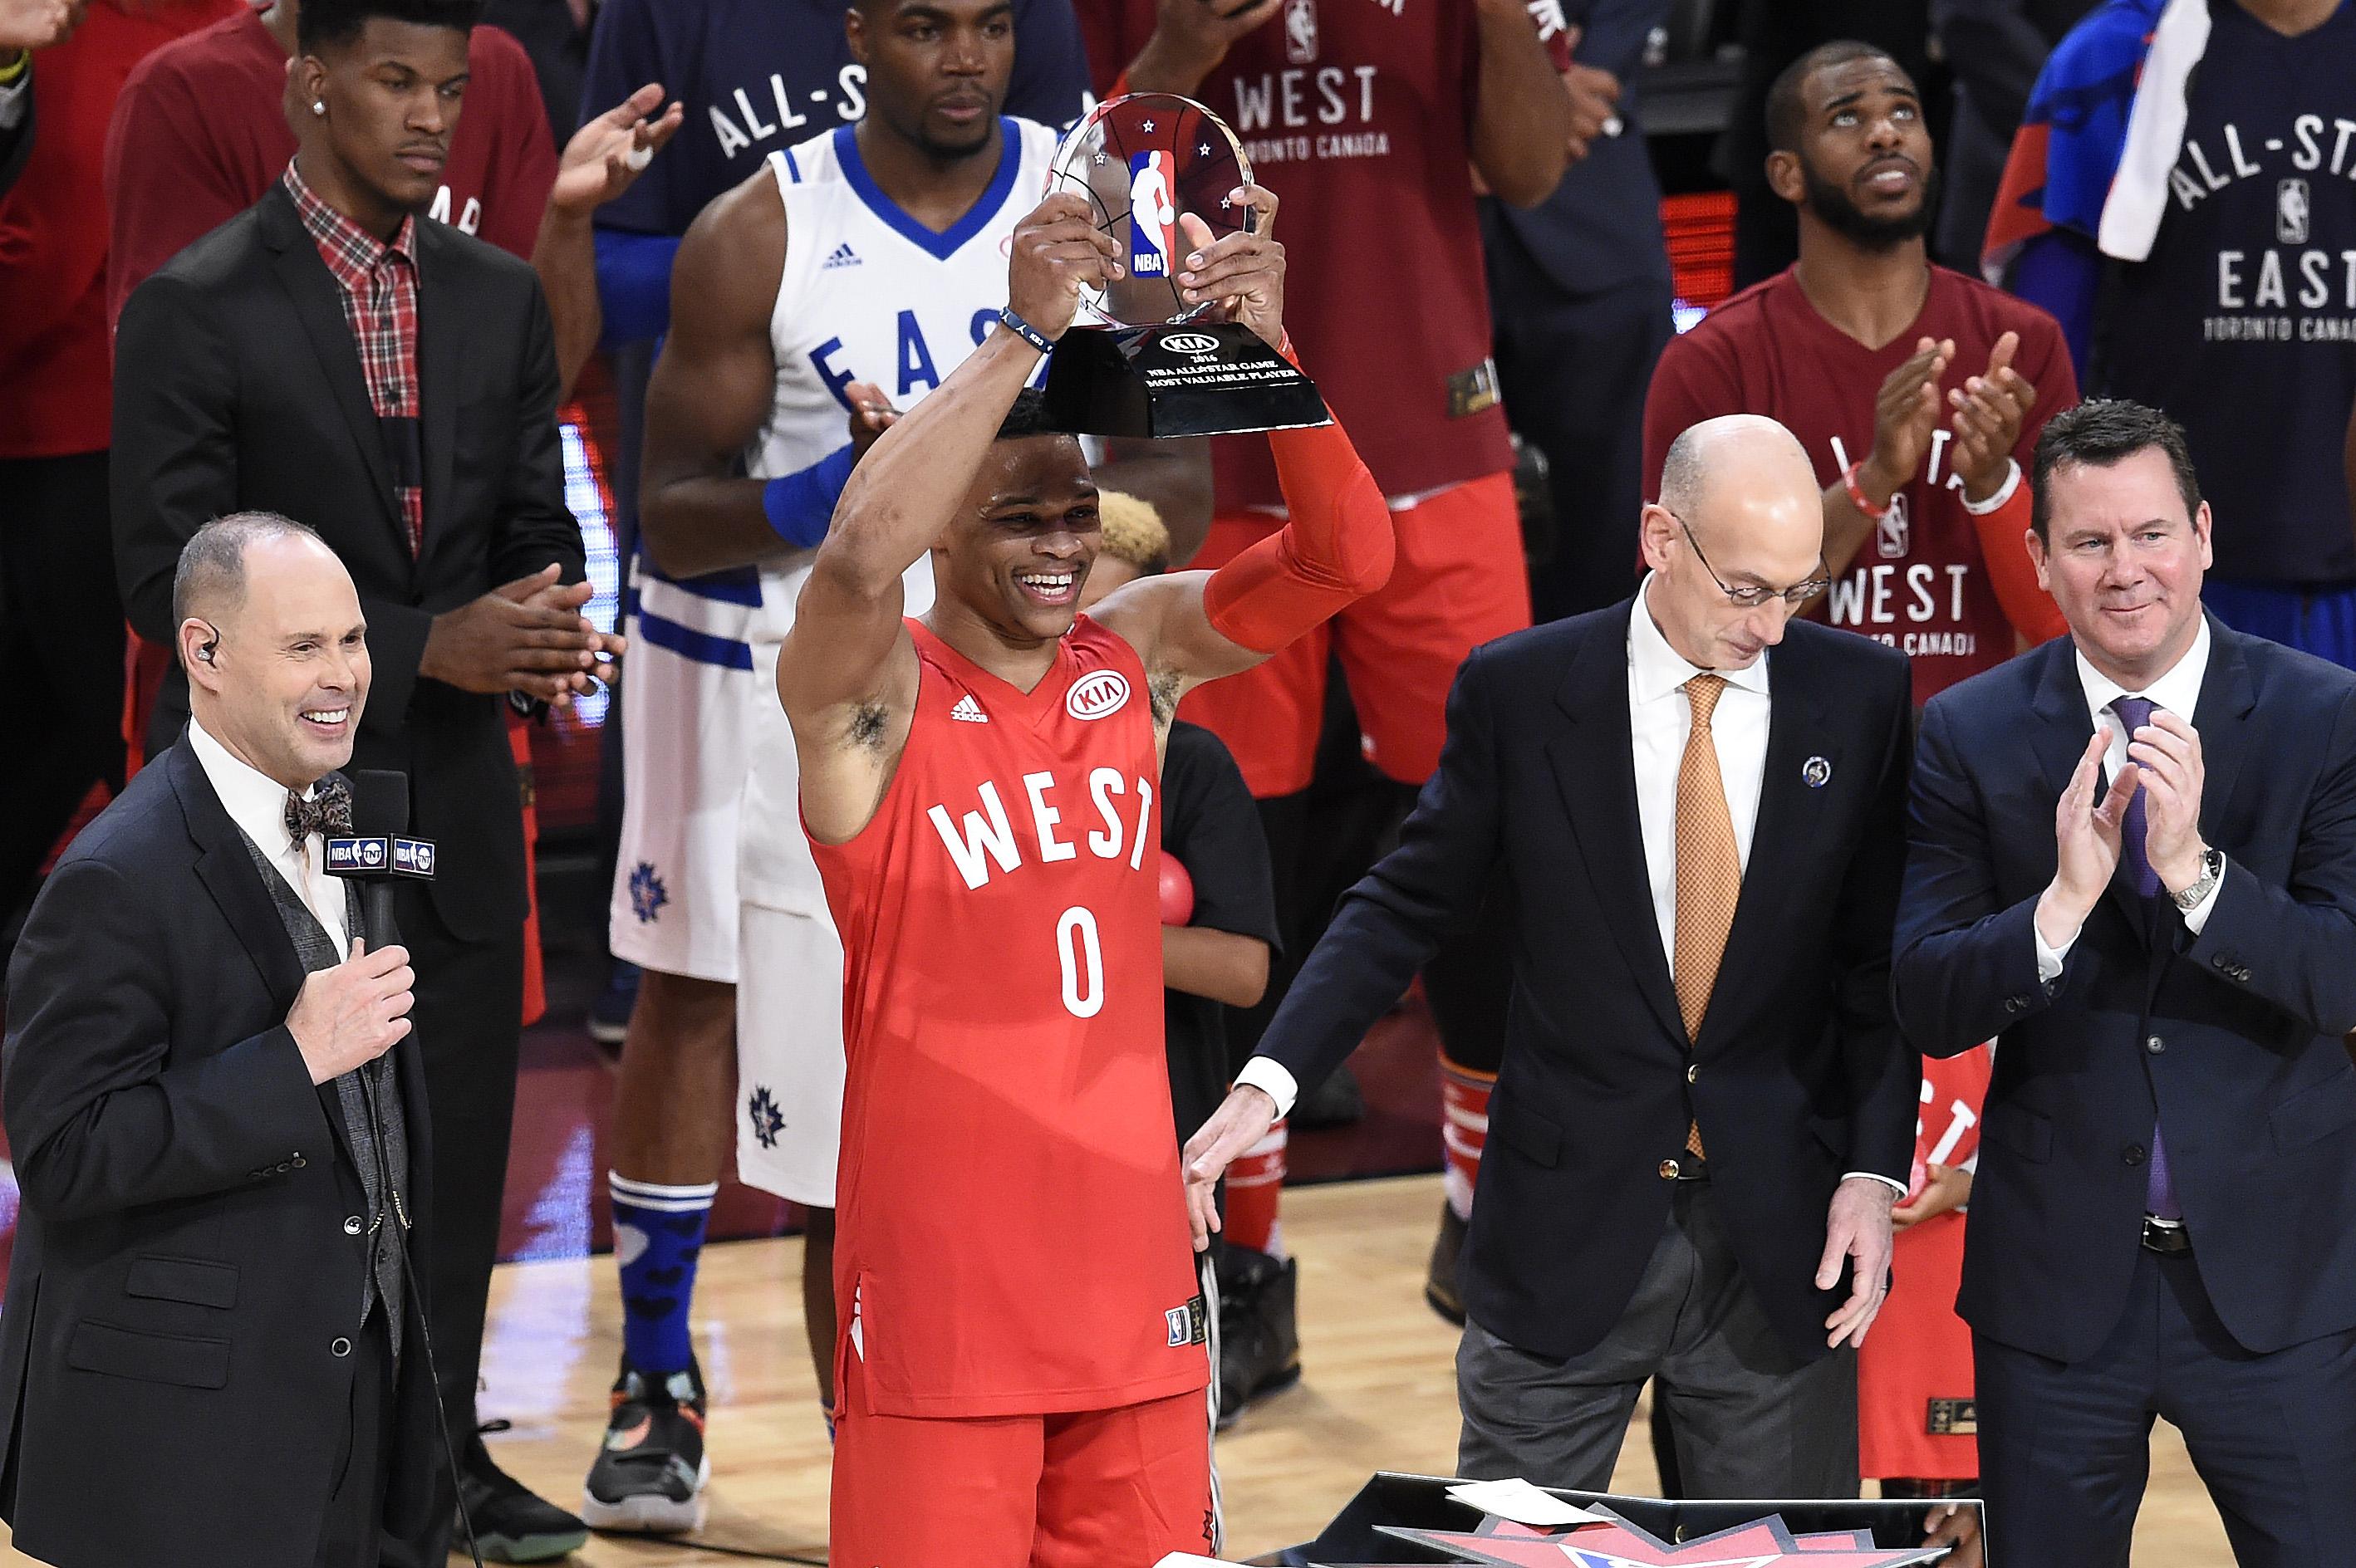 NBA: All Star Game